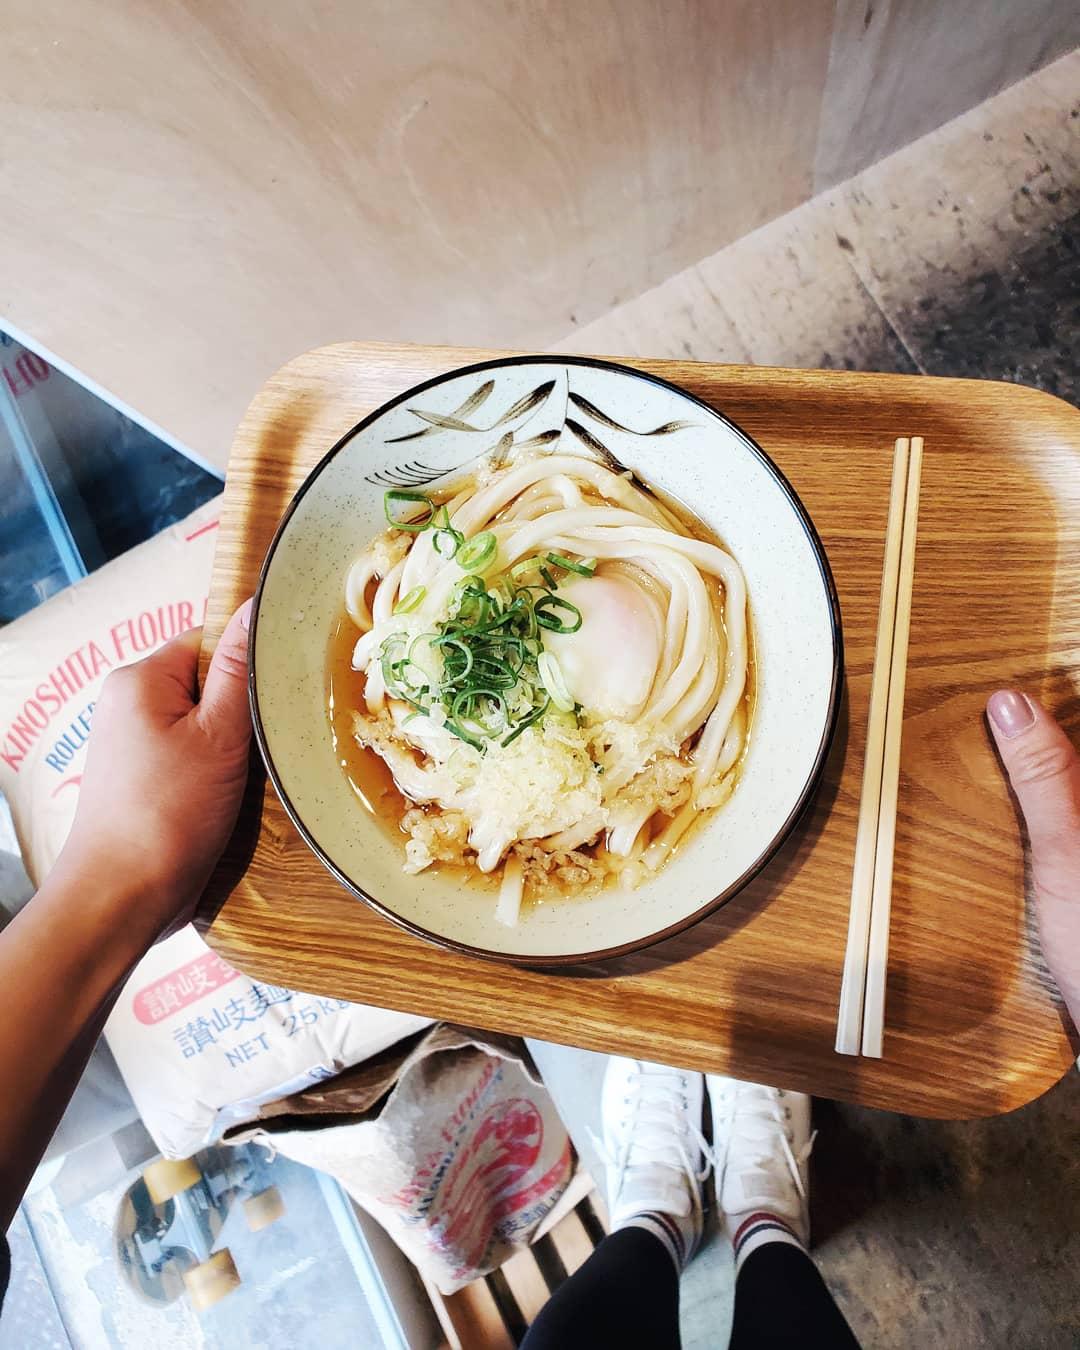 on the table - 温玉ぶつかけ // ontama butsu kake